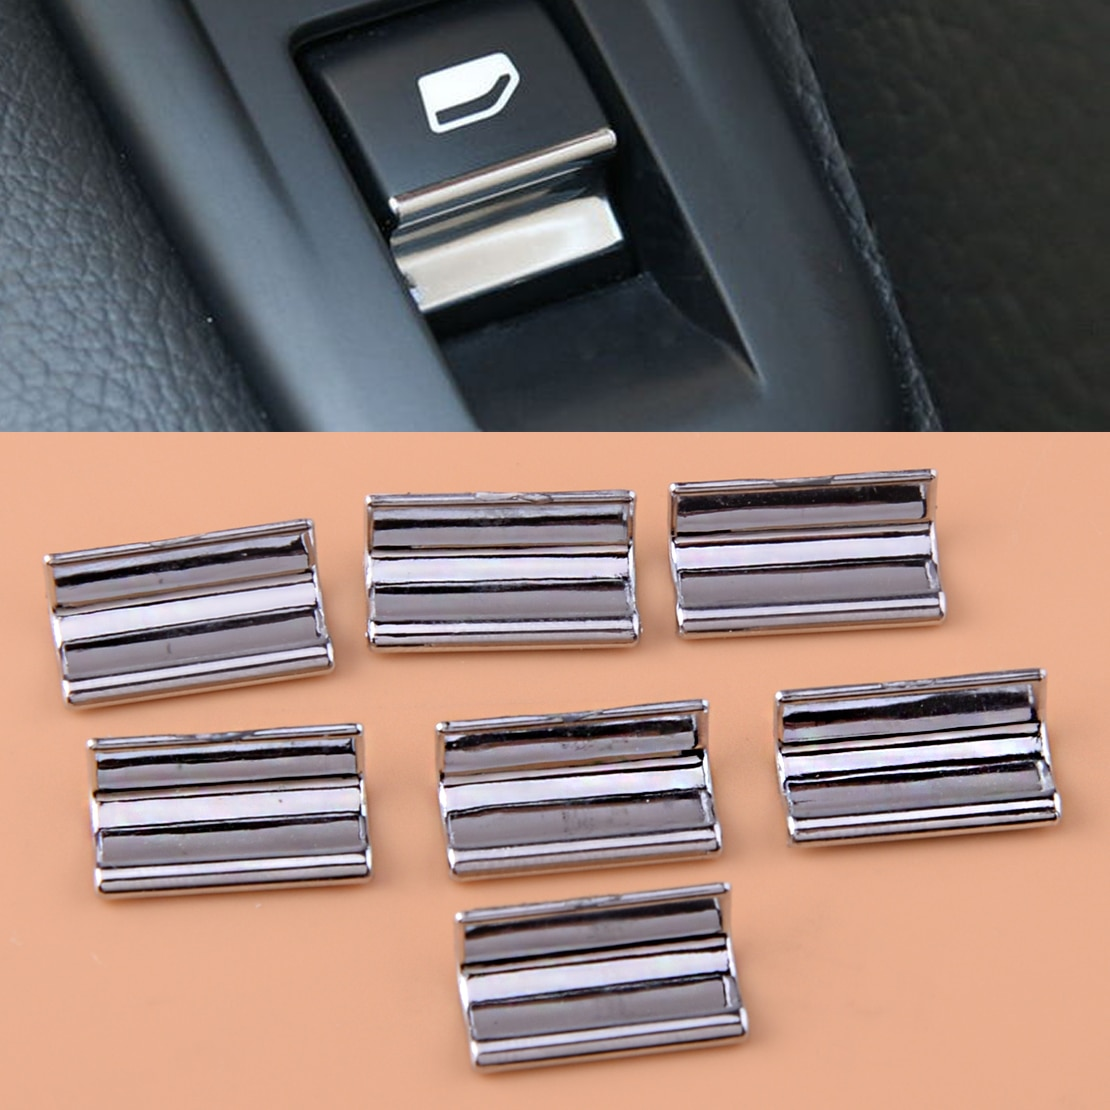 Beler 7 Uds coche cromo ABS cubierta de ventana de puerta de ascensor embellecedor de interruptor de botón Ajuste para Peugeot 308, 3008, 2014, 2015, 2016, 2017, 2018, 2018